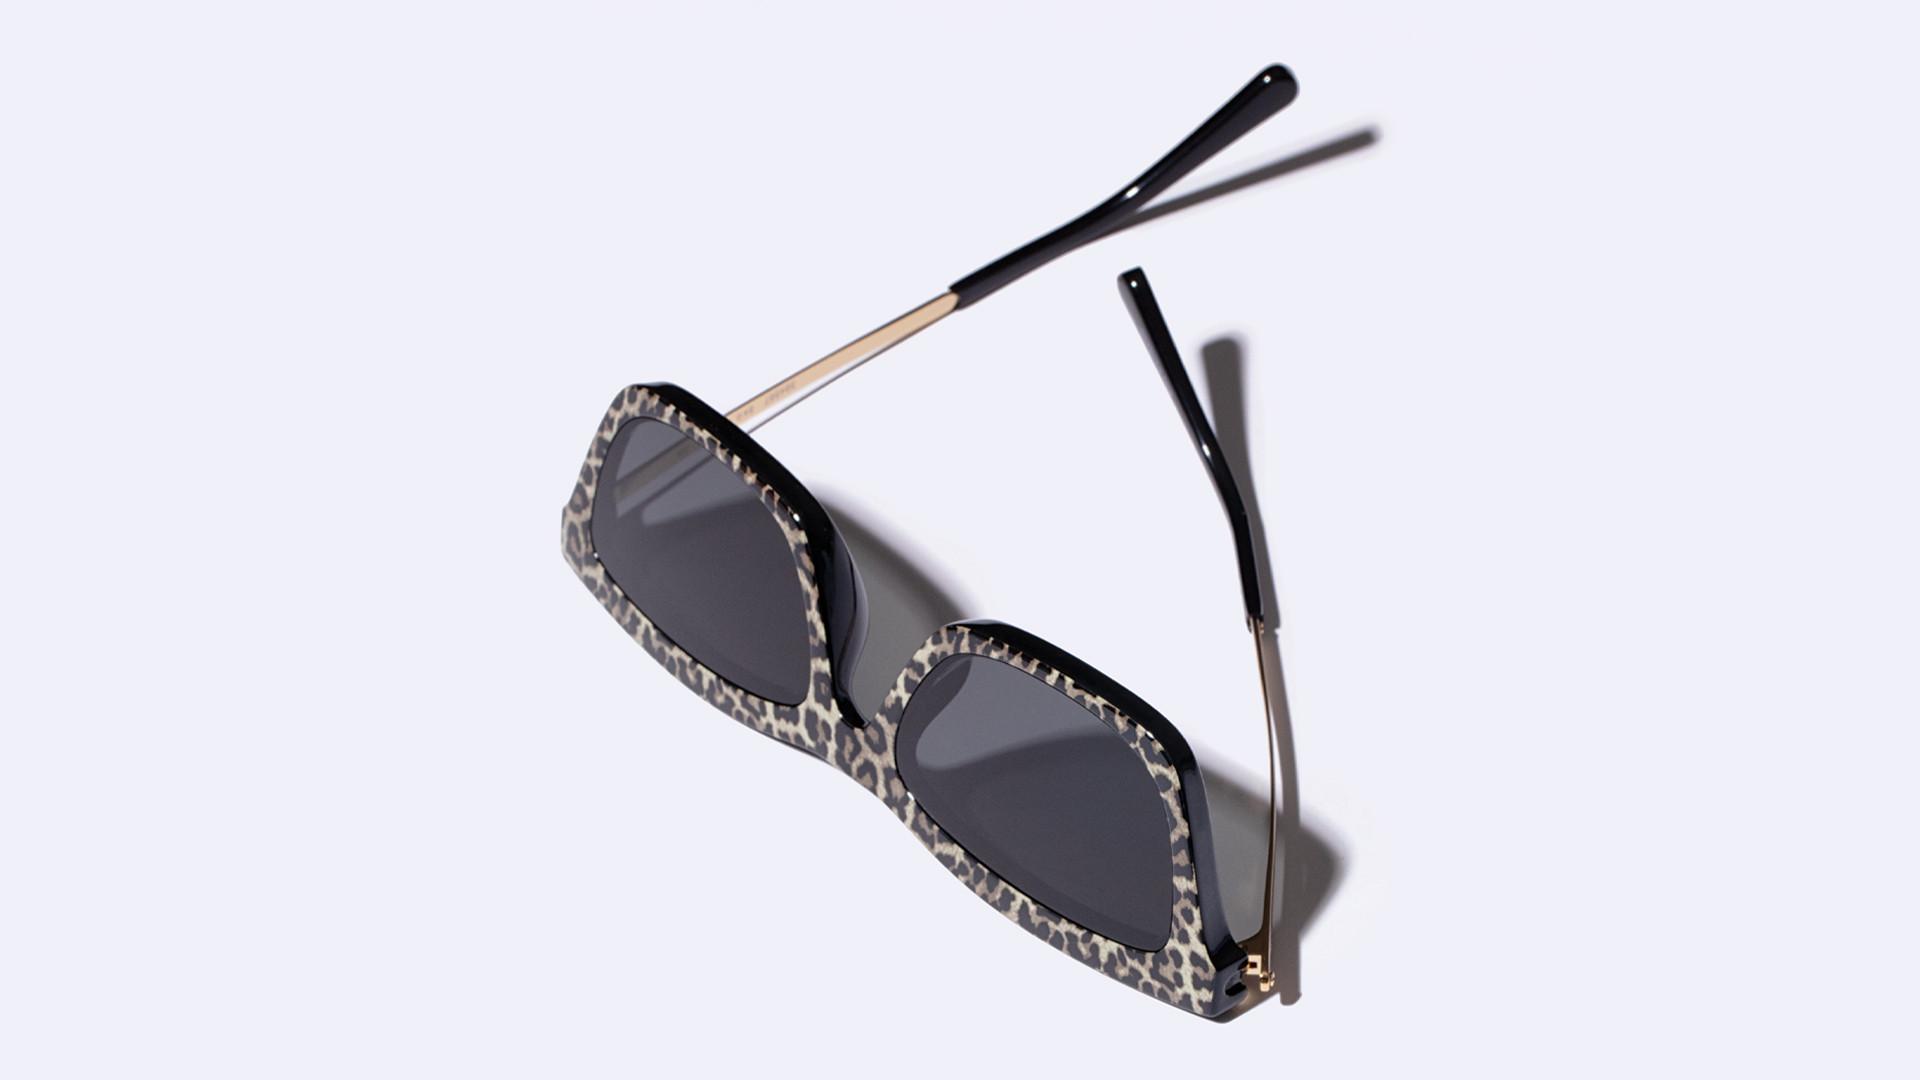 Michael Kors Stowe sunglasses